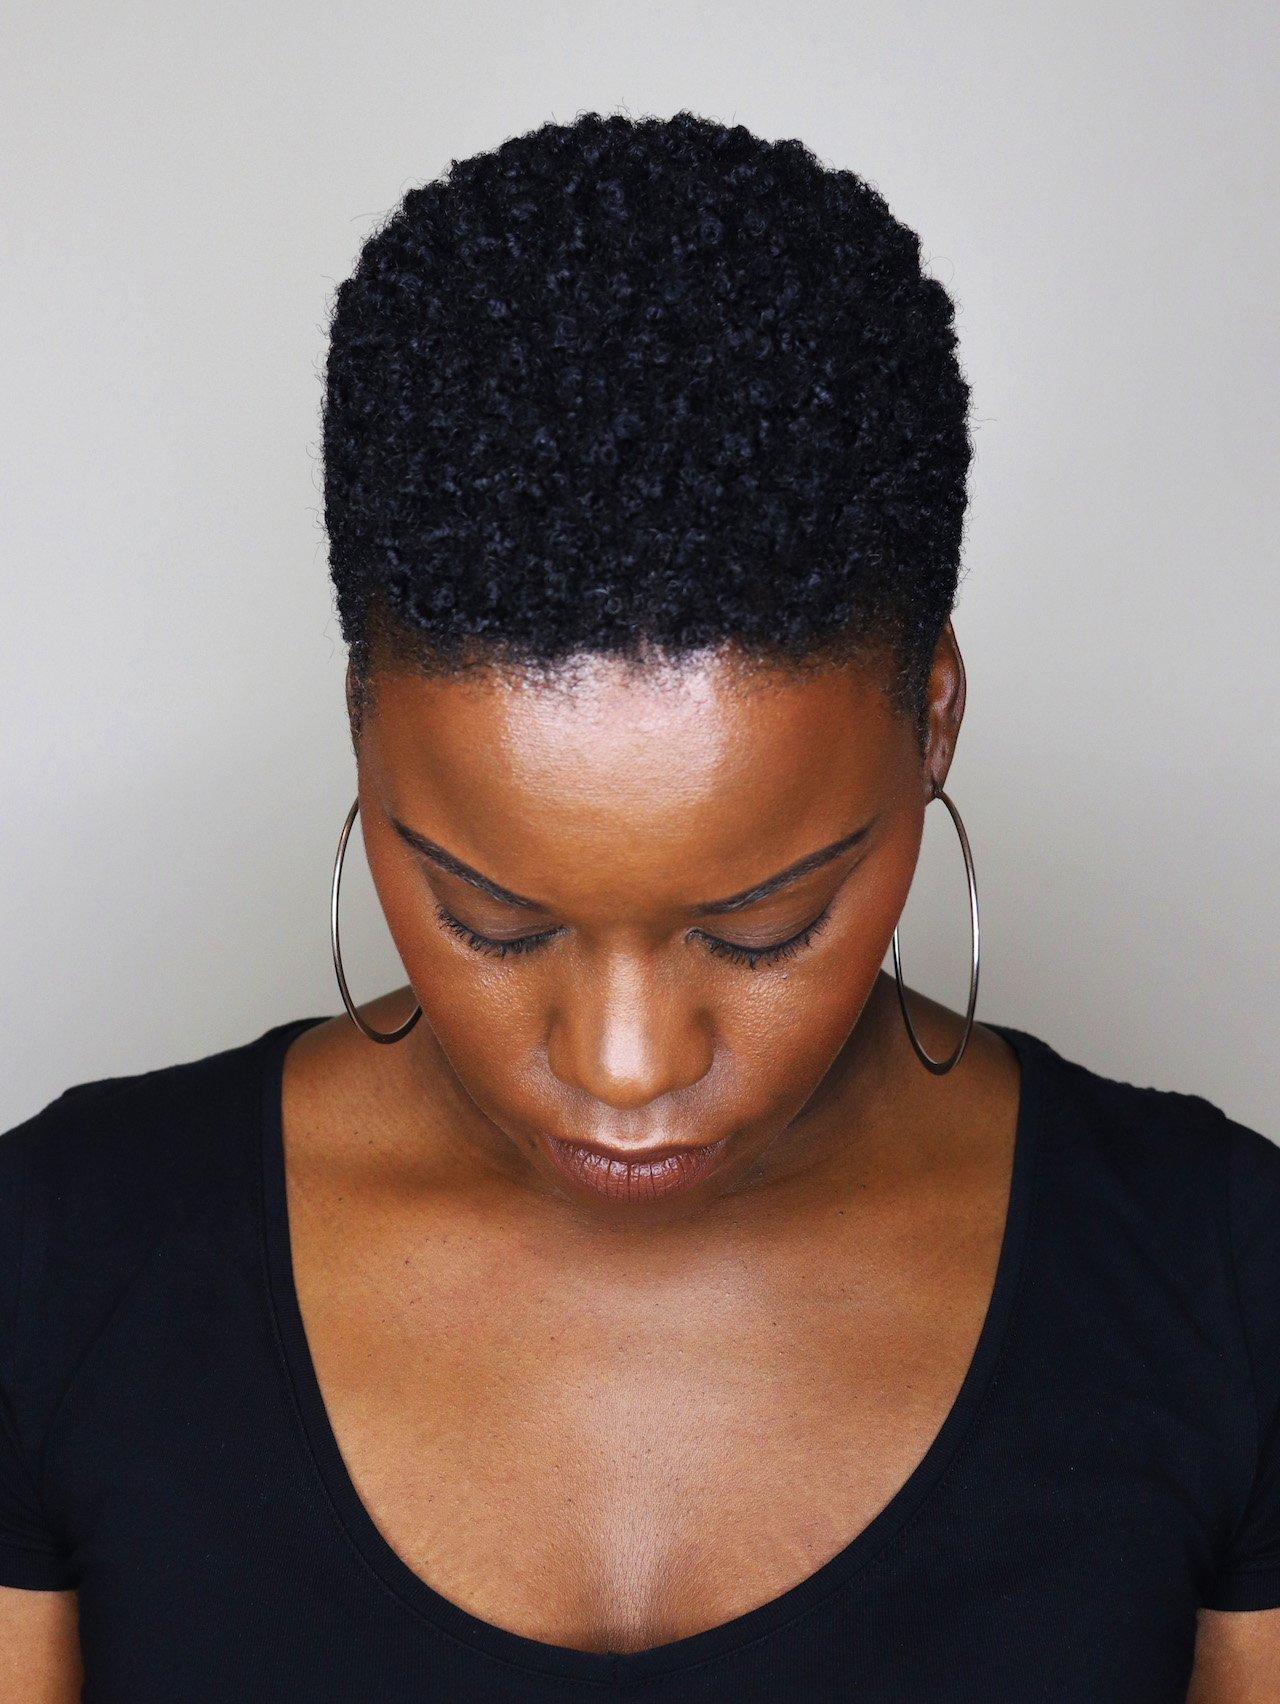 Glammzmore 2018 Q4 Hair Growth Challenge